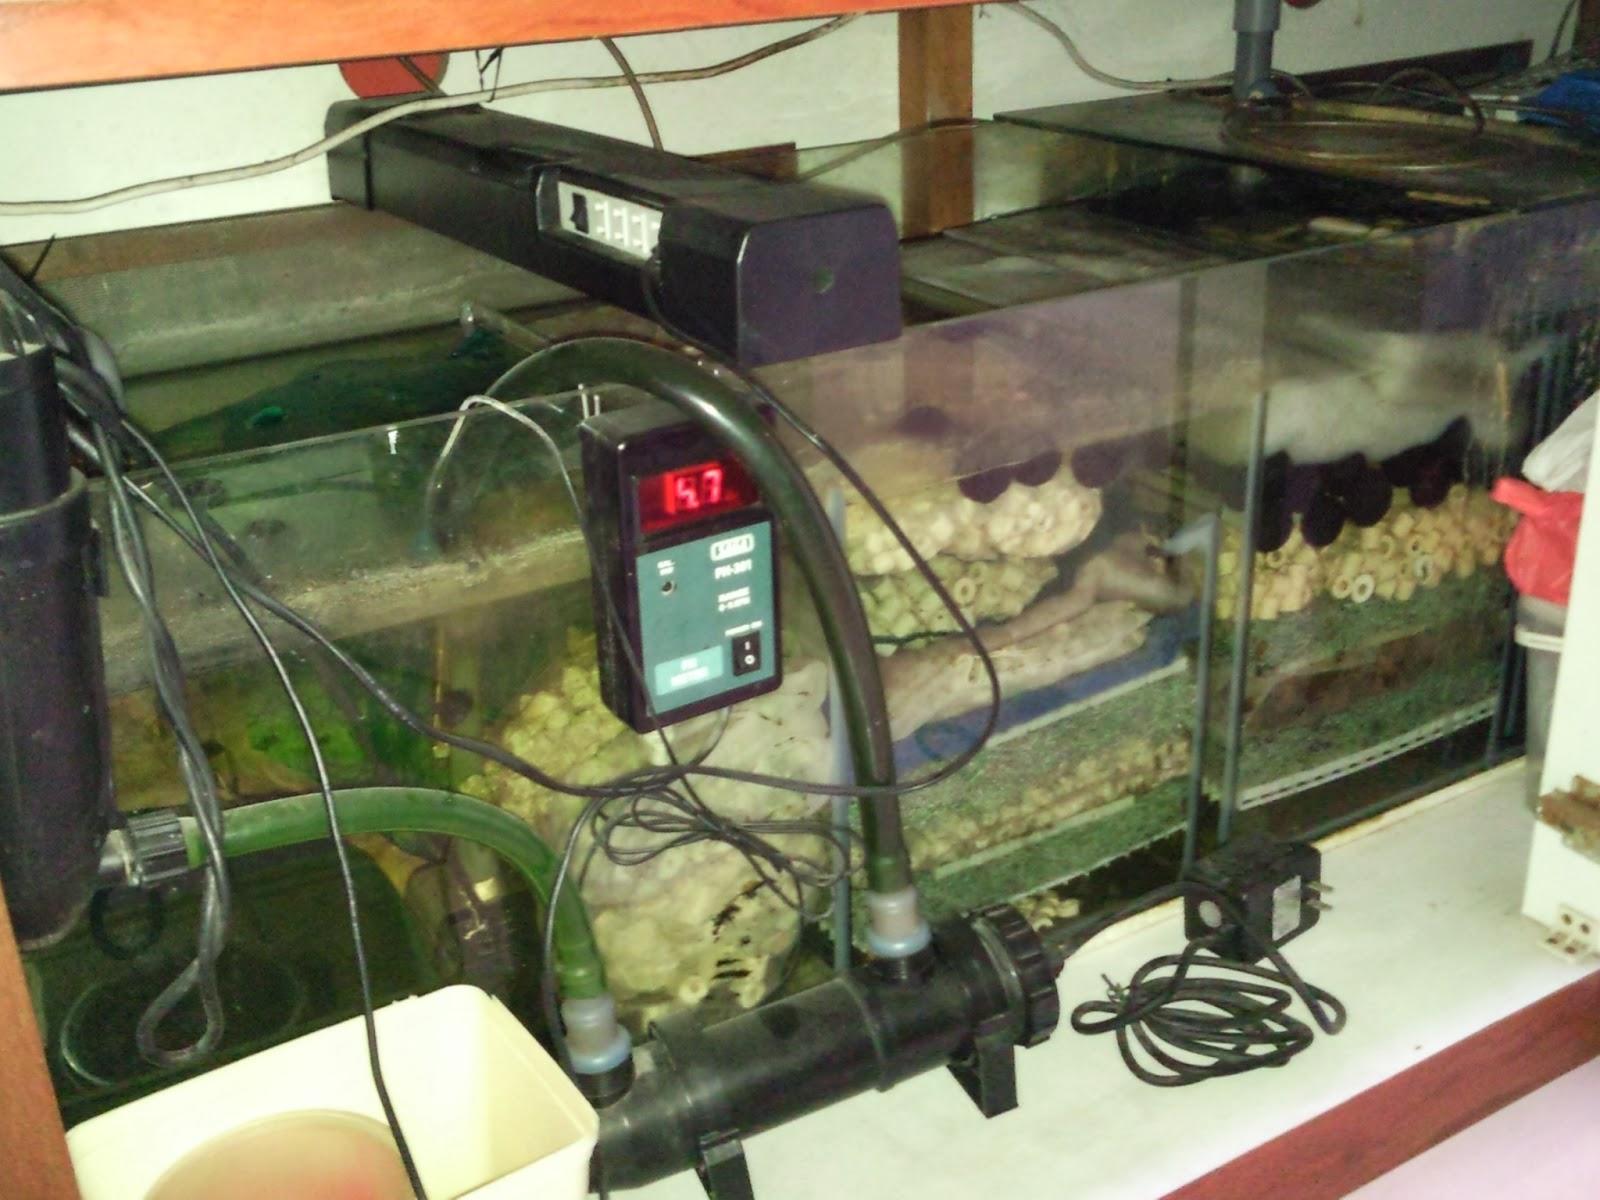 Fisher Man Fish Tanks And Aquarium CRS: 6 Feet Fish Tank for Sale